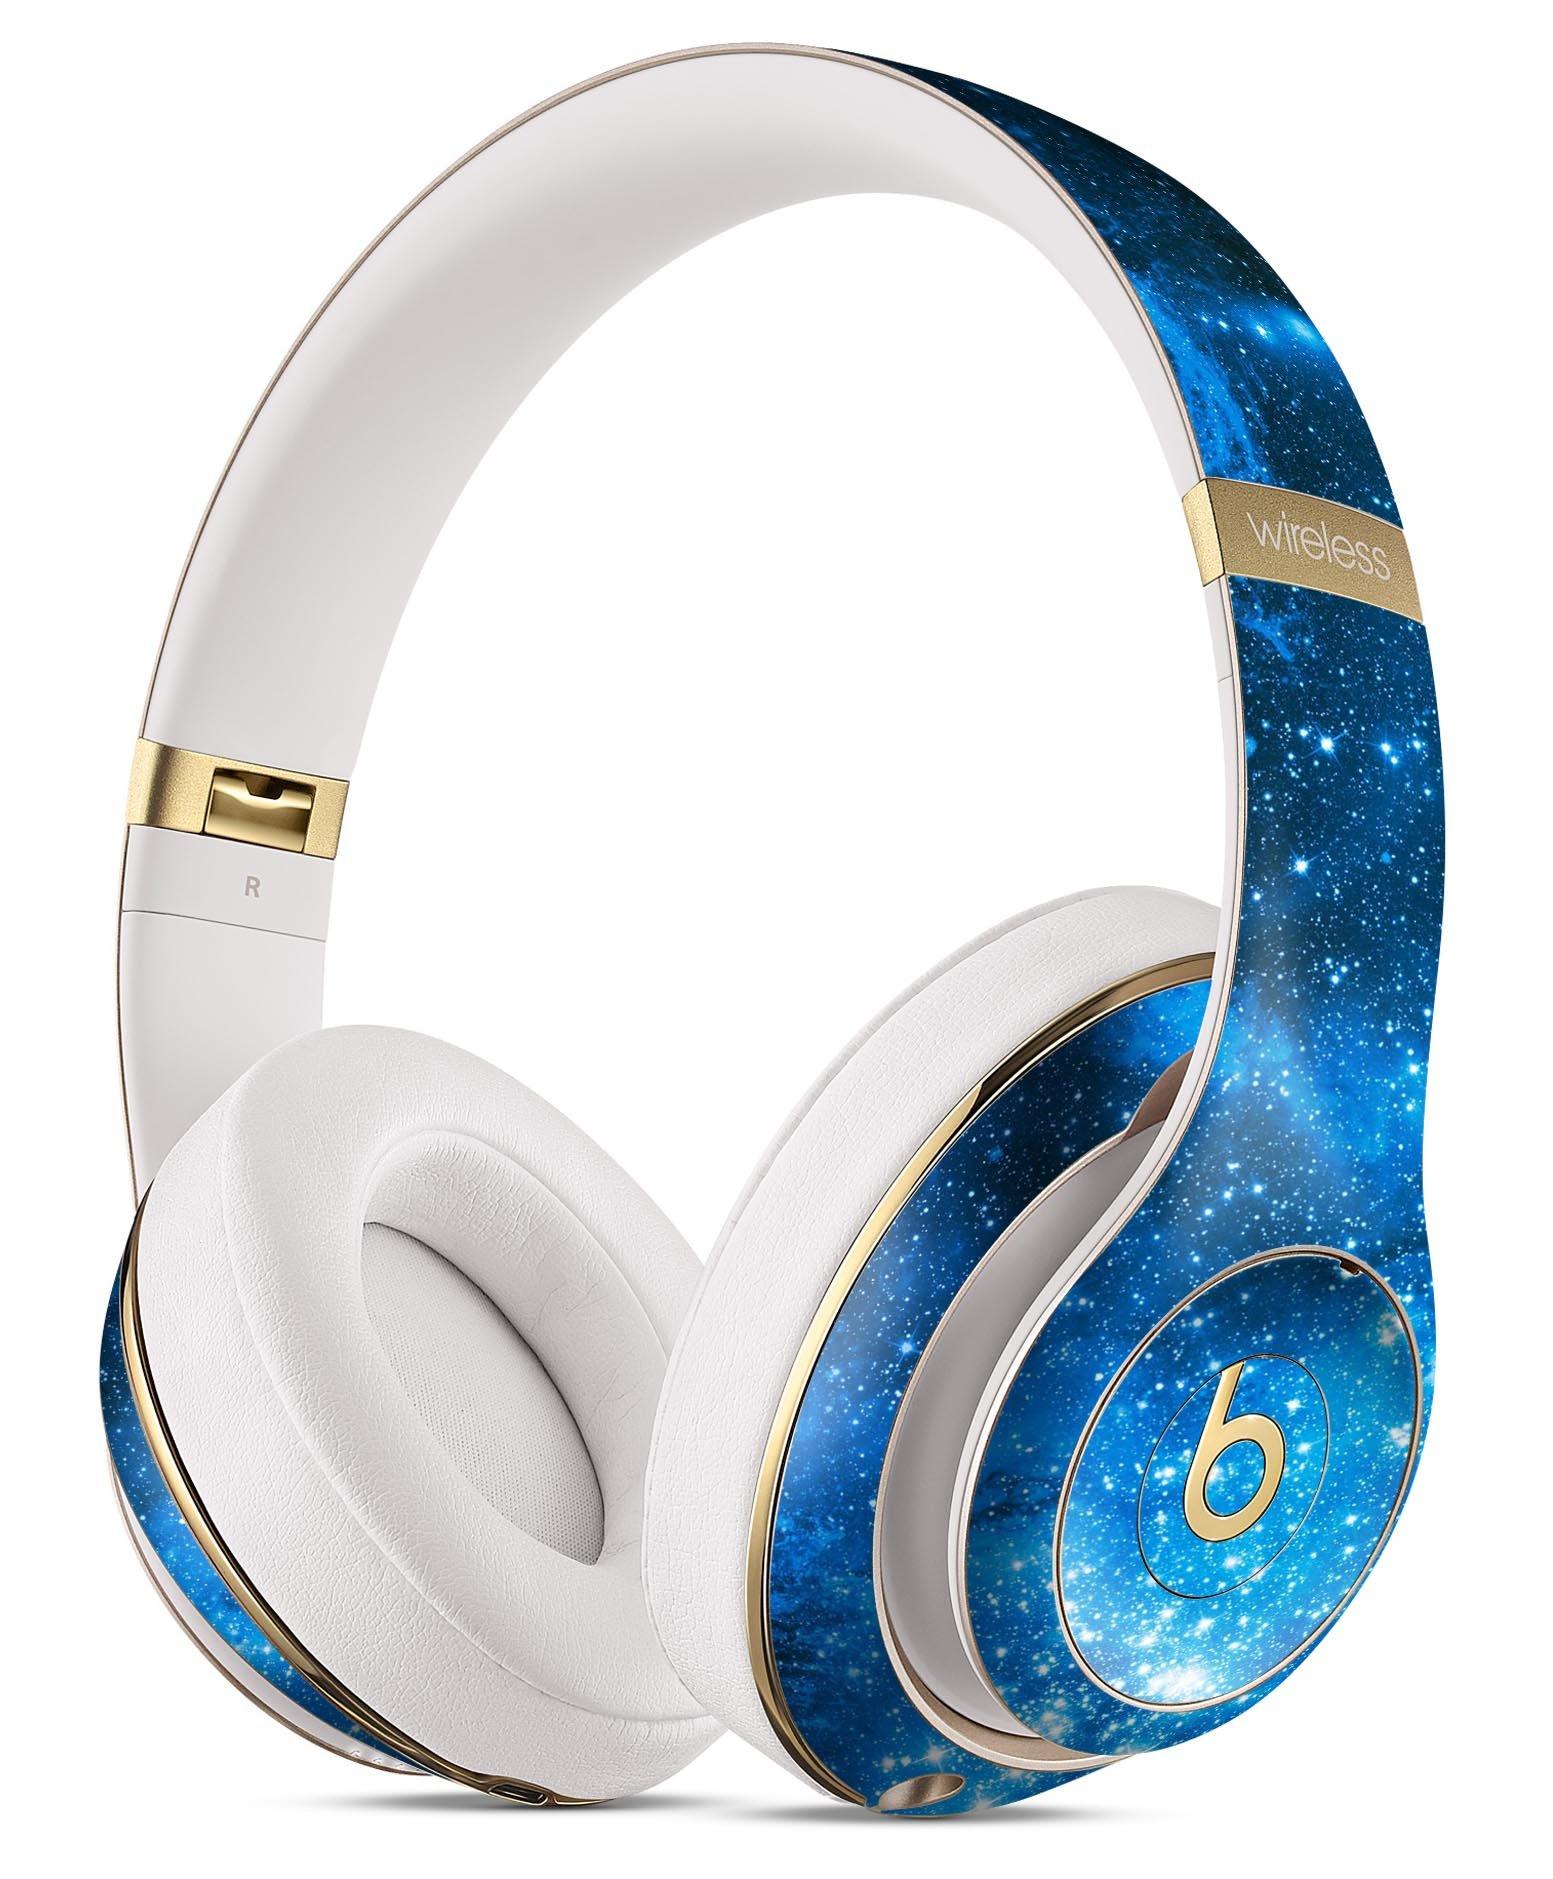 Blue Hue Nebula DesignSkinz Full-Body Skin Kit for the Beats by Dre Studio Remastered Wireless Headphones / Ultra-Thin / Matte Finished / Protective Skin Wrap